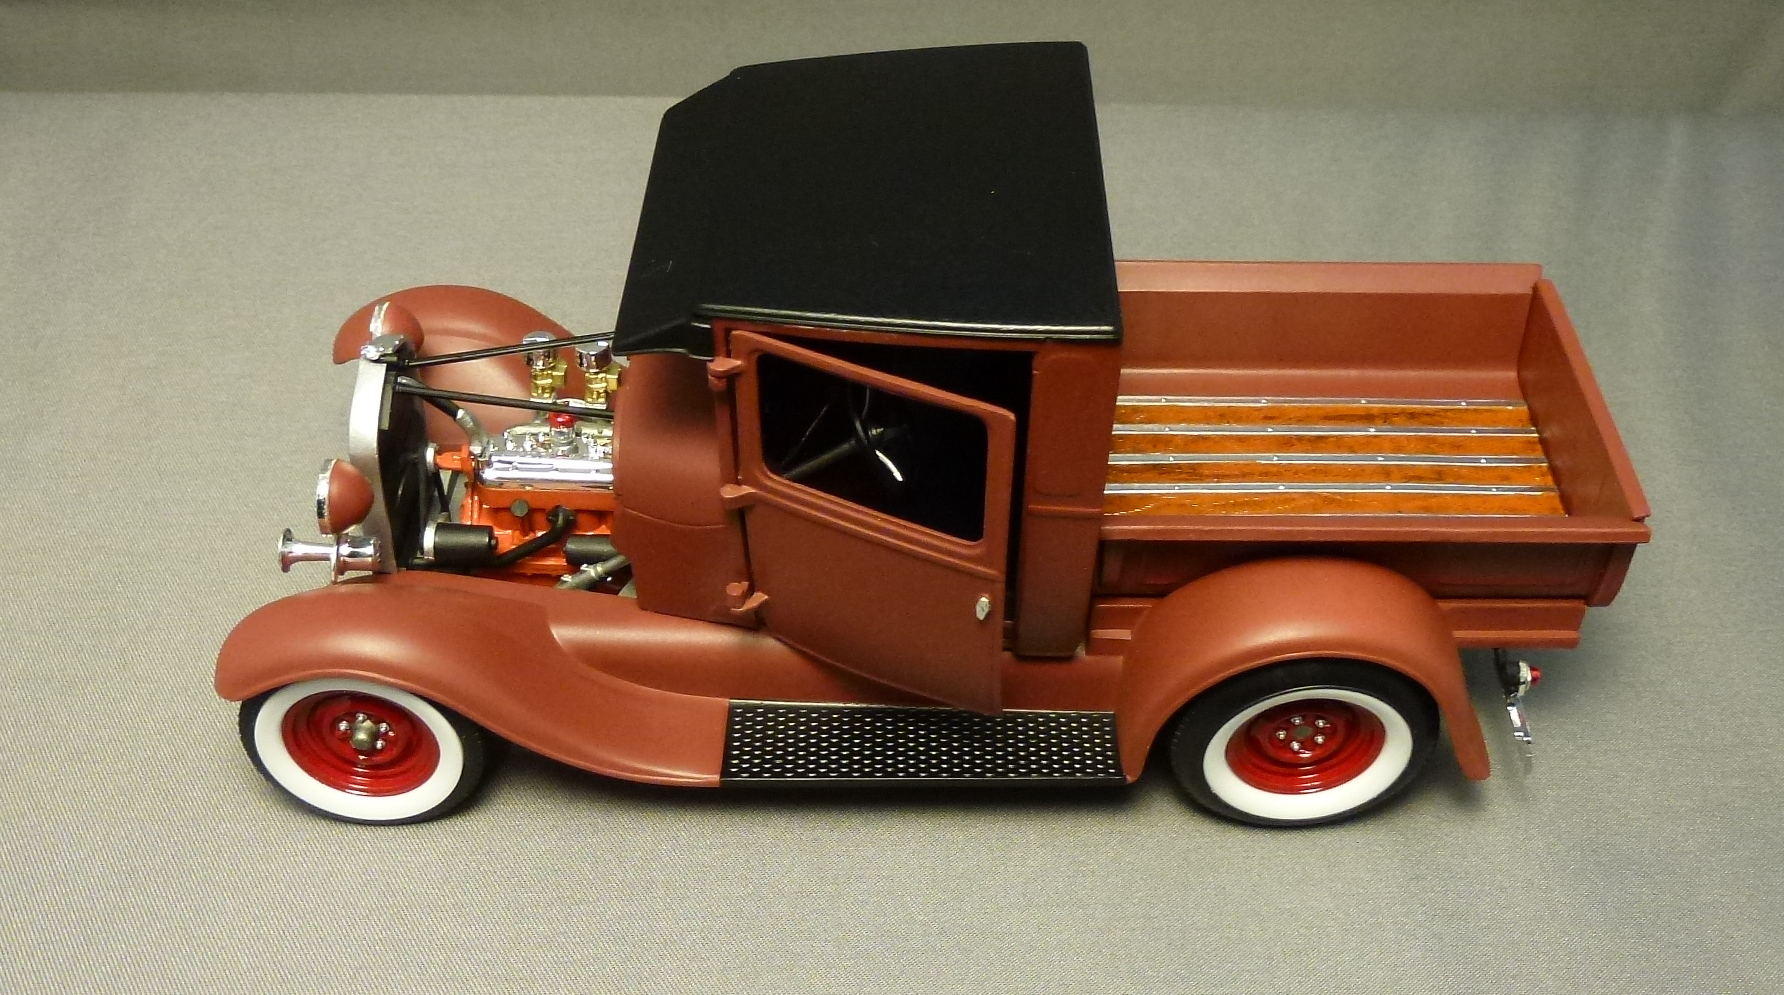 1929 Ford Rat Truck Revell Scale Importnut Net